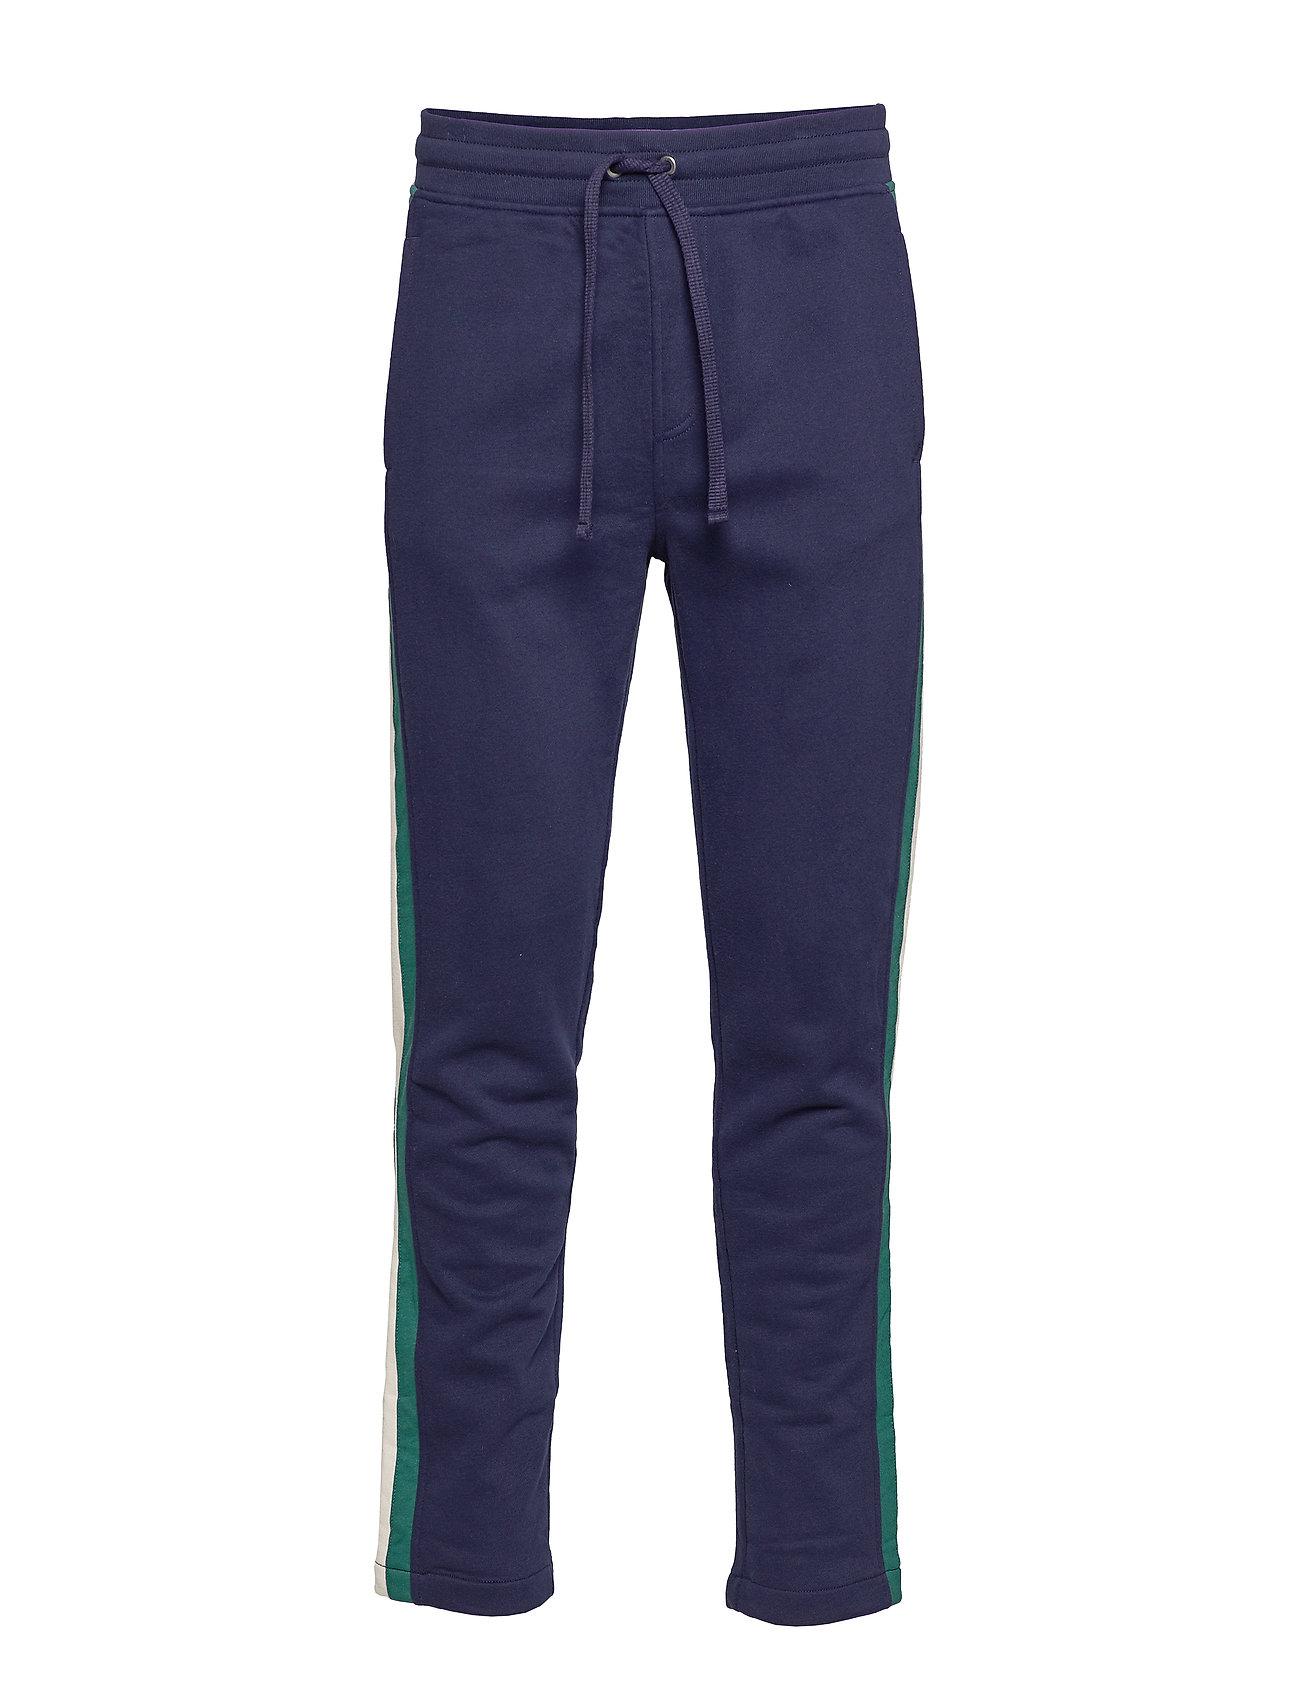 GAP Varsity Stripe Sweatpants - TAPESTRY NAVY